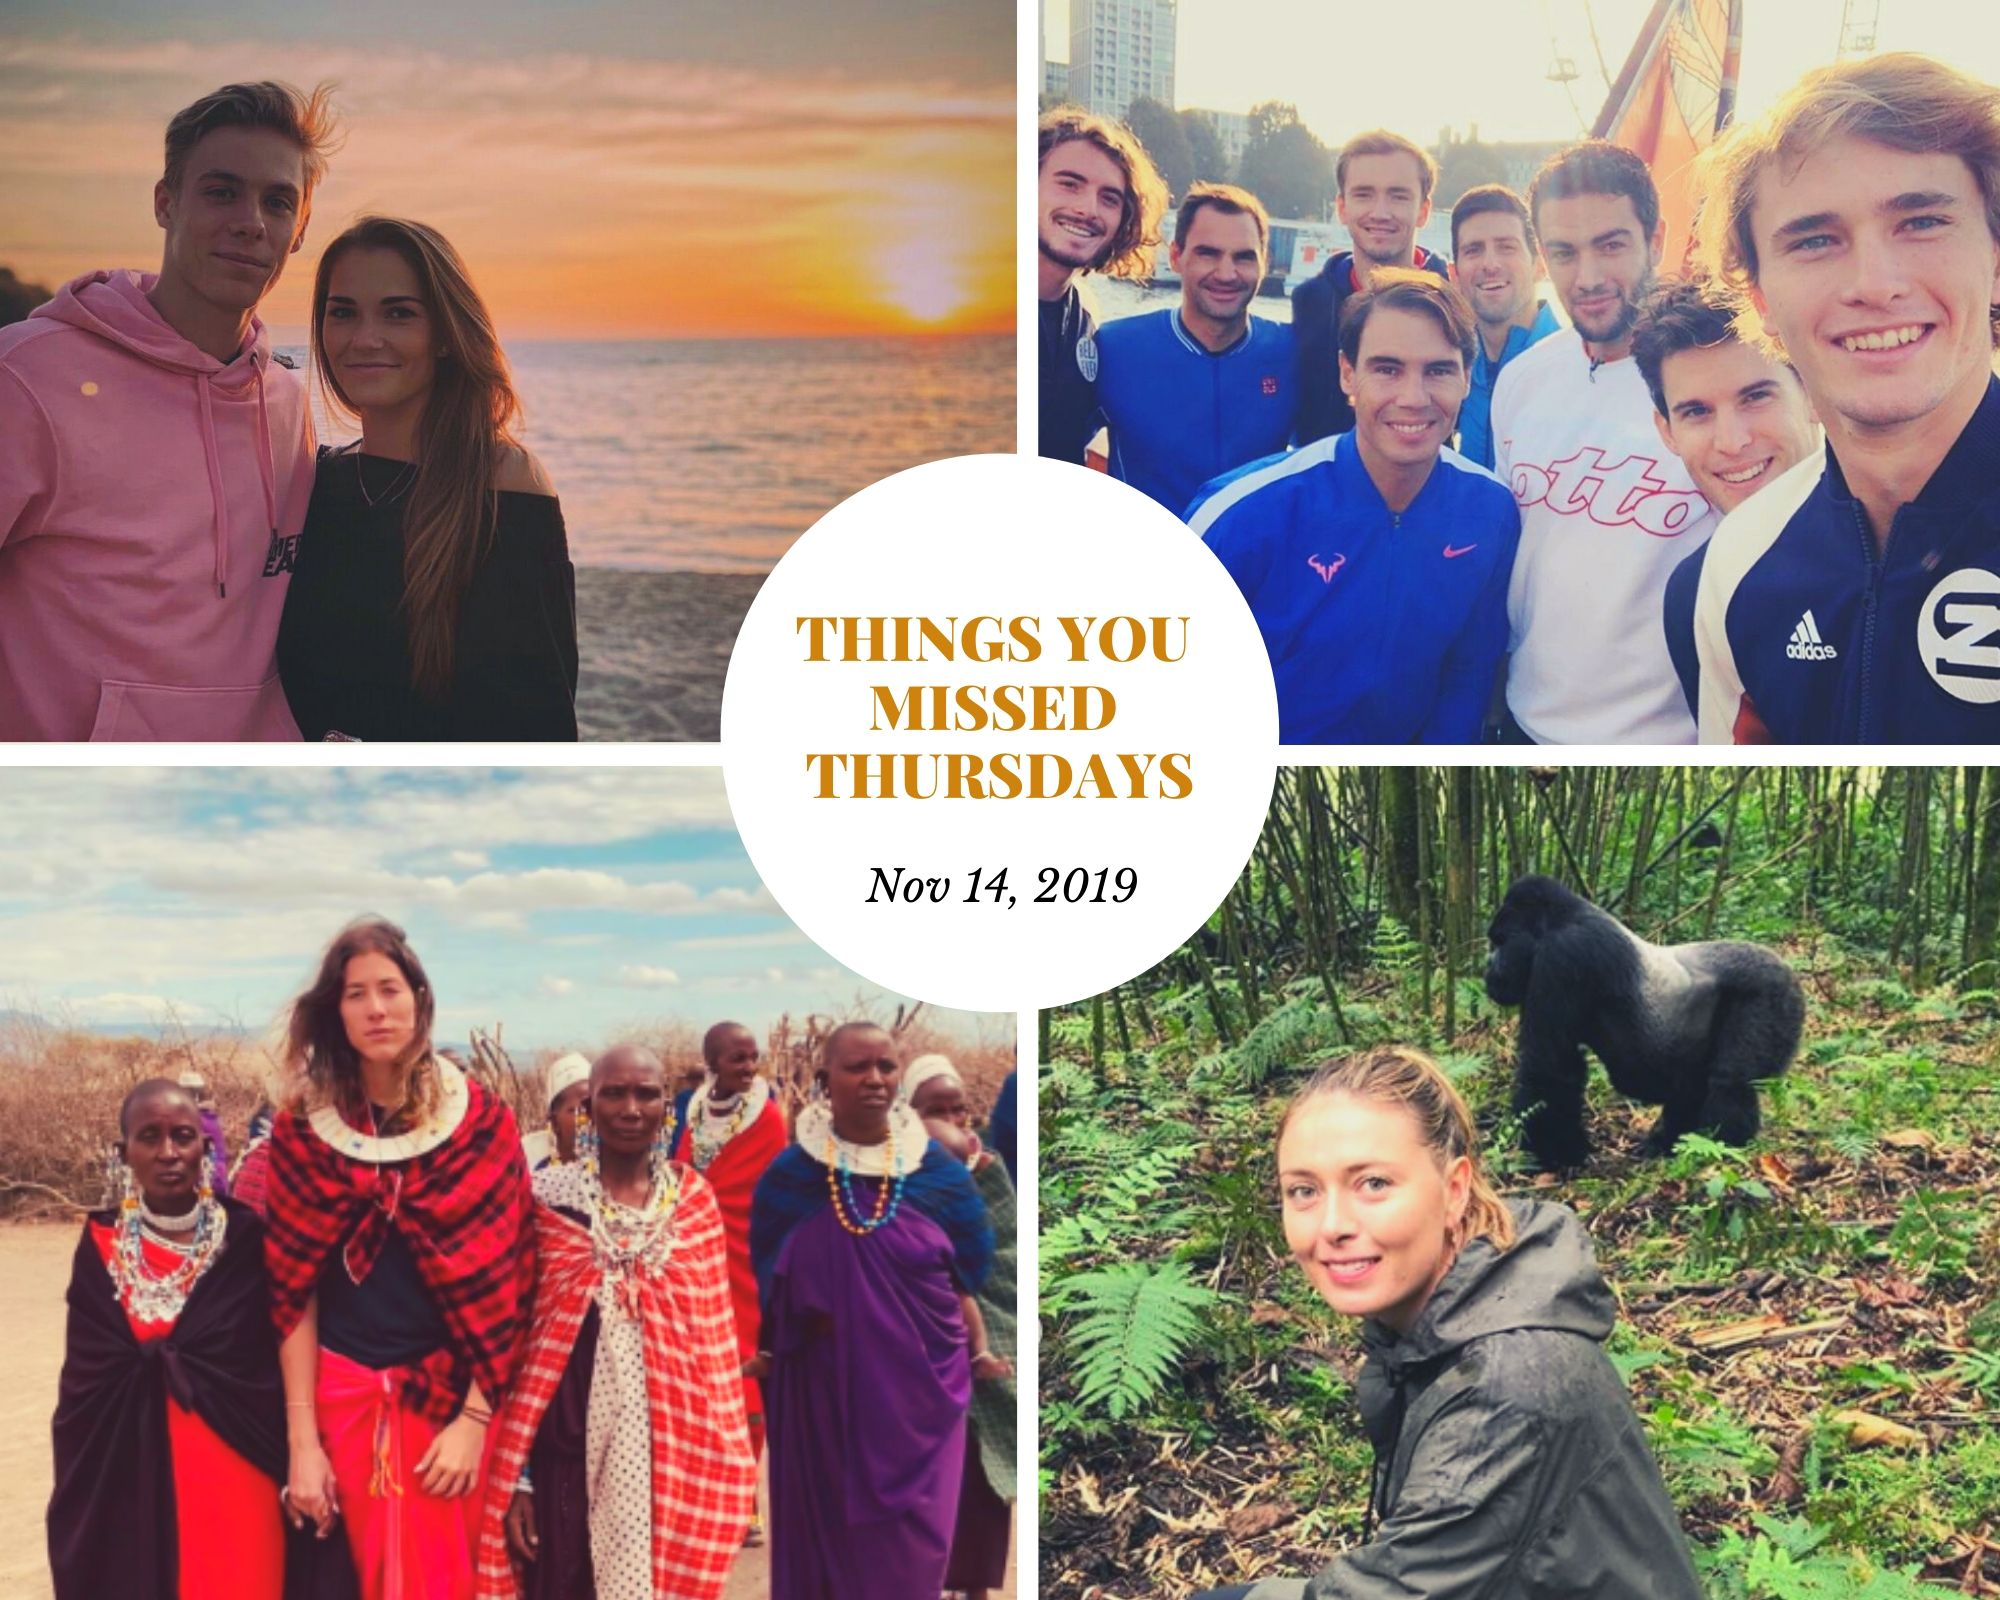 Things You Missed Thursdays – Nov 14